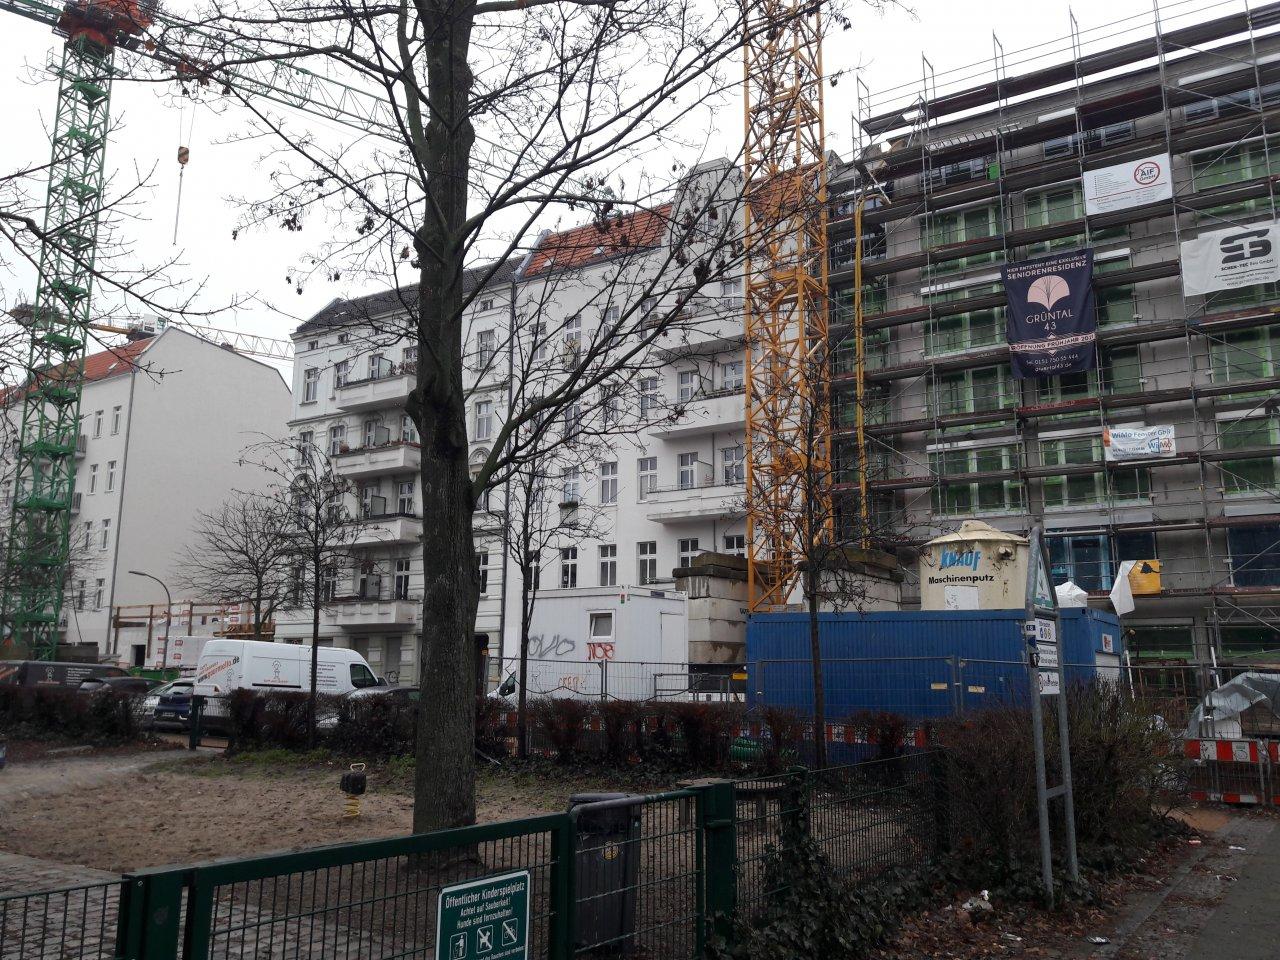 Neubauten-Gruentaler-Strasse.jpg